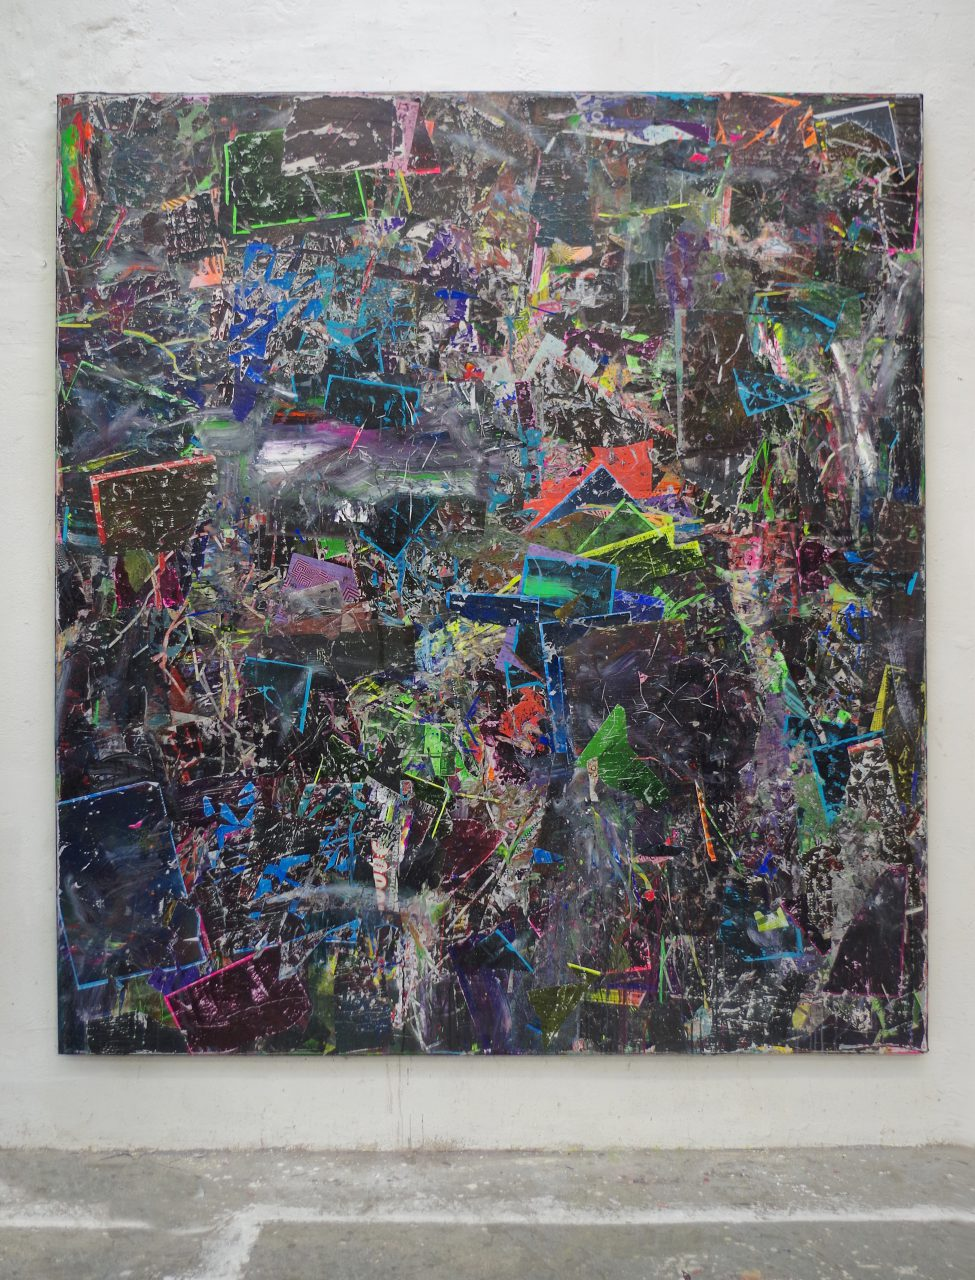 2019, Acryl, Spraypaint, Papier, Leinwand, Keilrahmen 220 x 200 cm